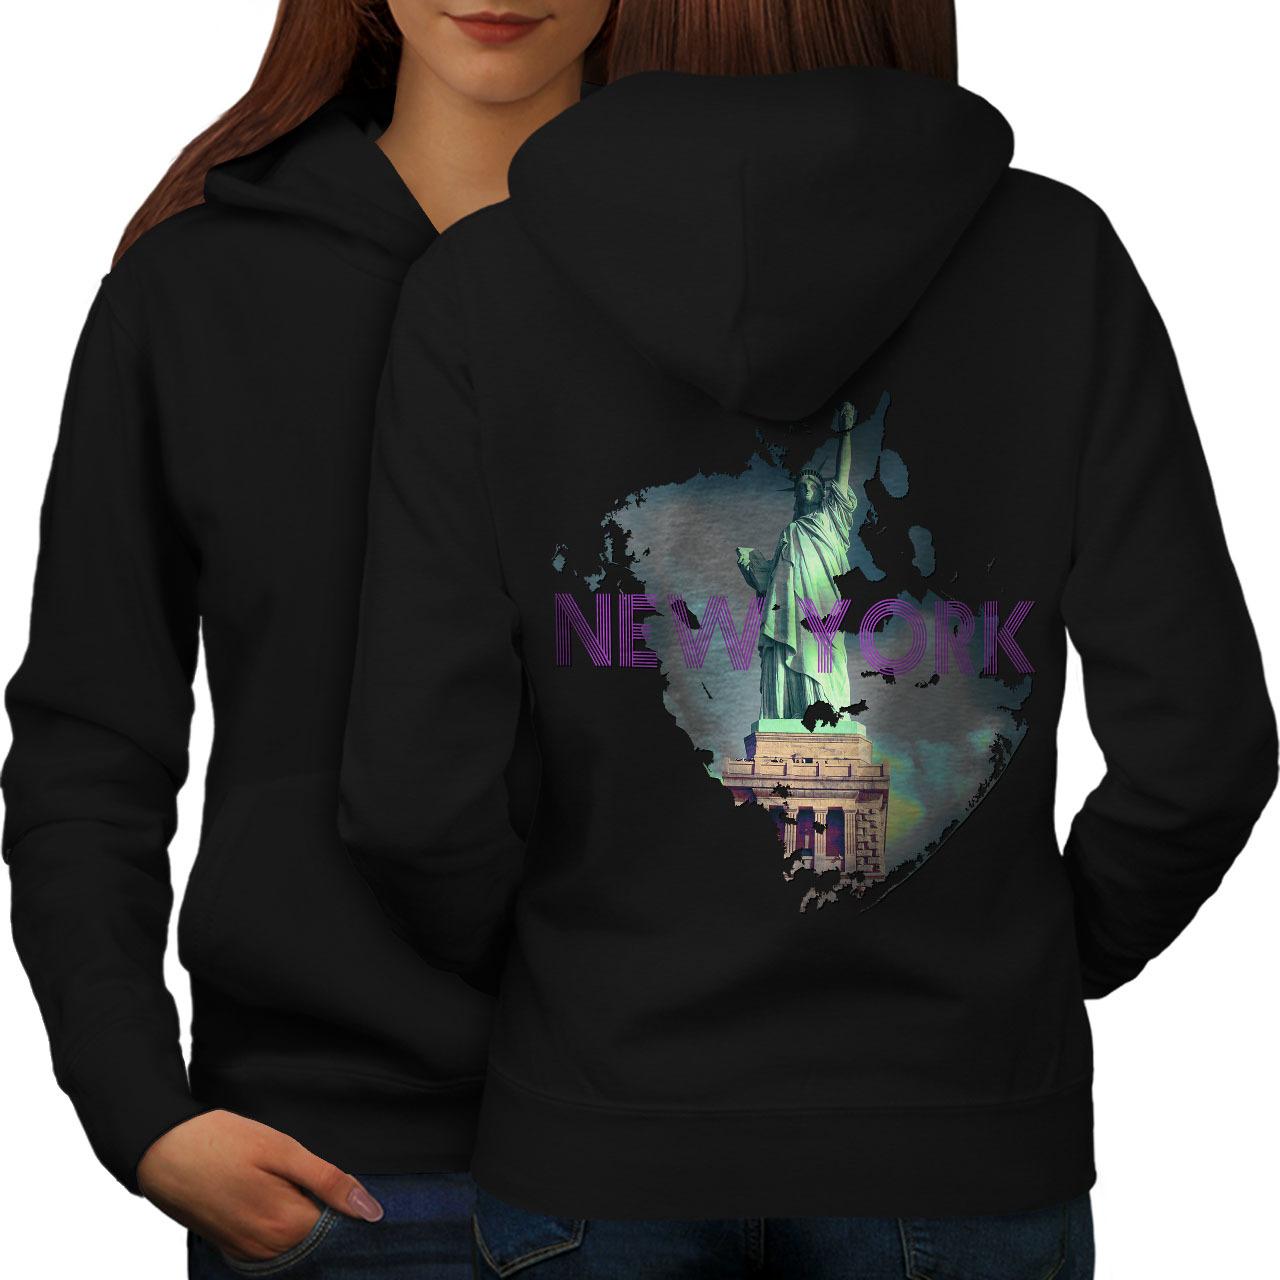 New York Liberty City USA Sweatshirt Hoody USA America Women Hoodie Back - $21.99 - $22.99